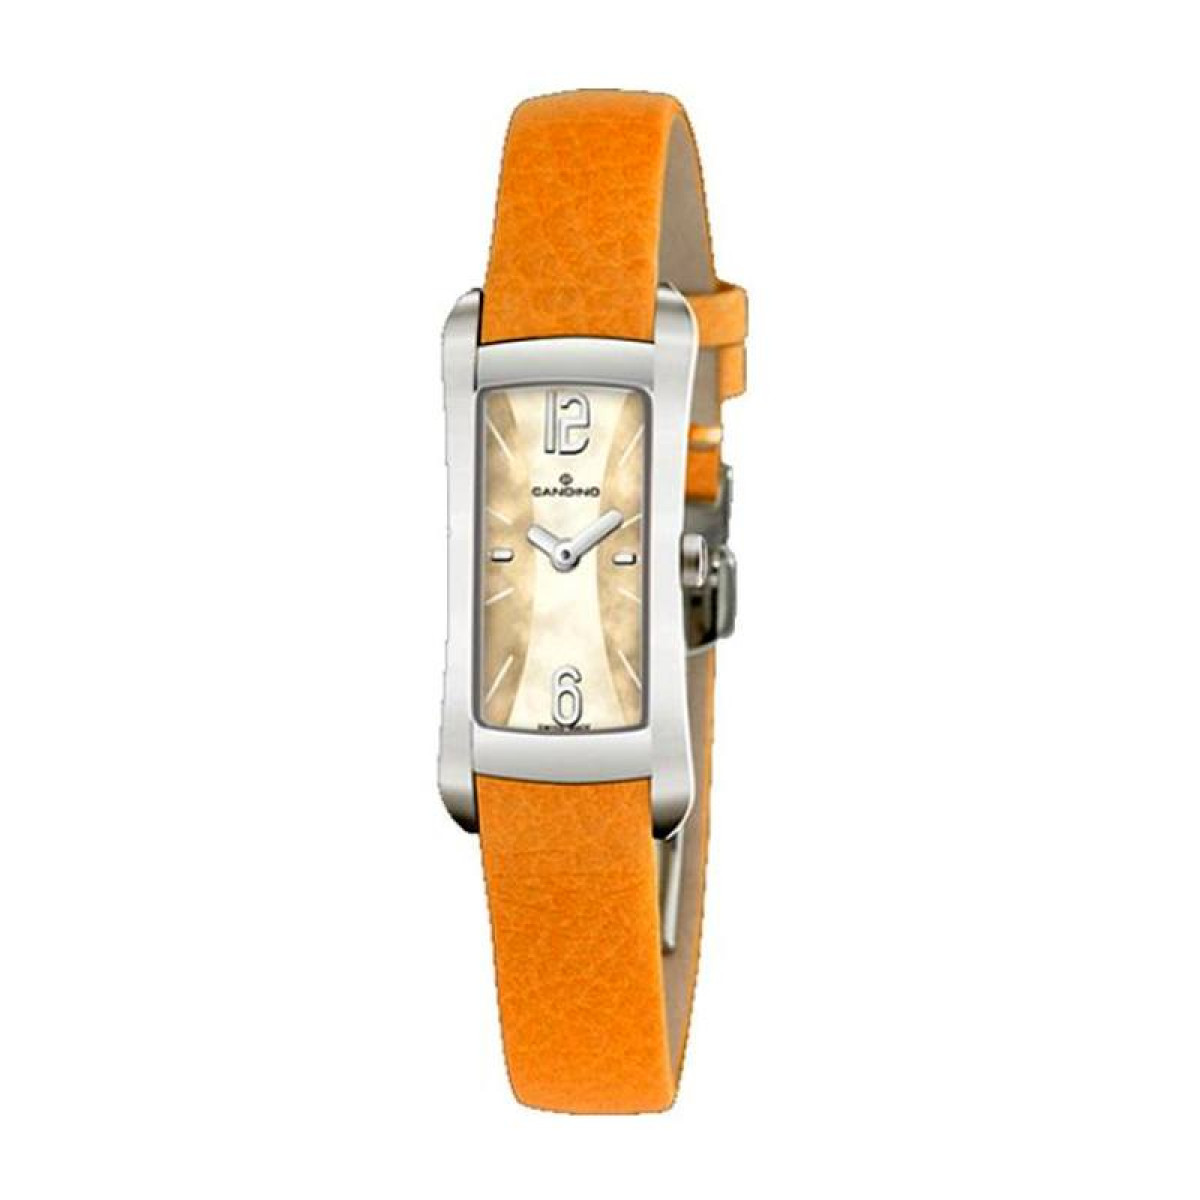 Часовник Candino C4356/3